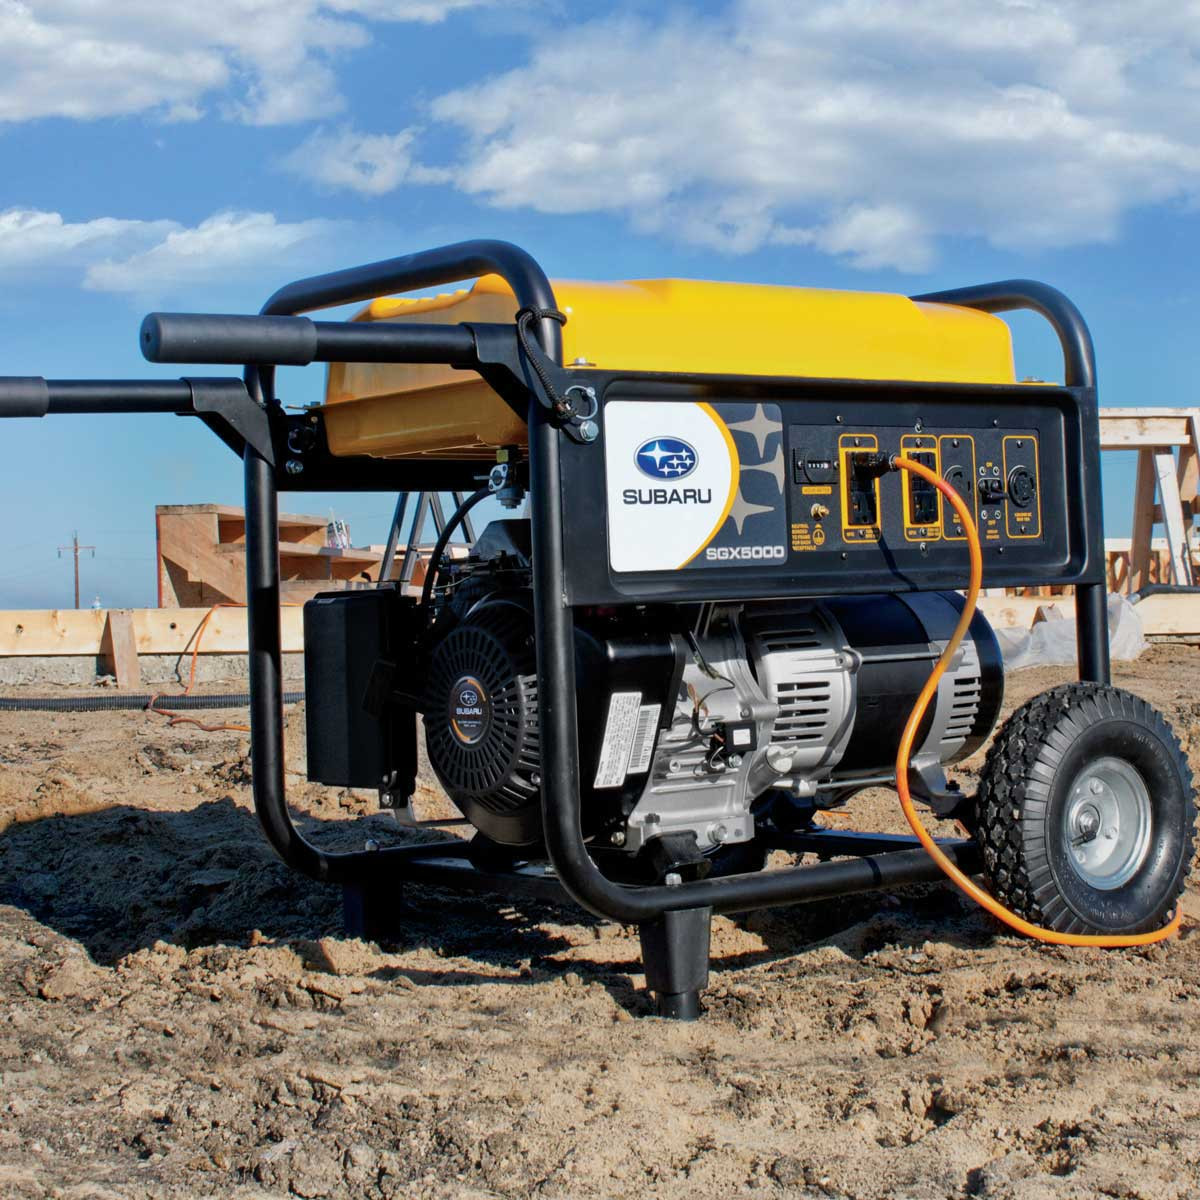 Two-Wheel Kit portable subaru generator